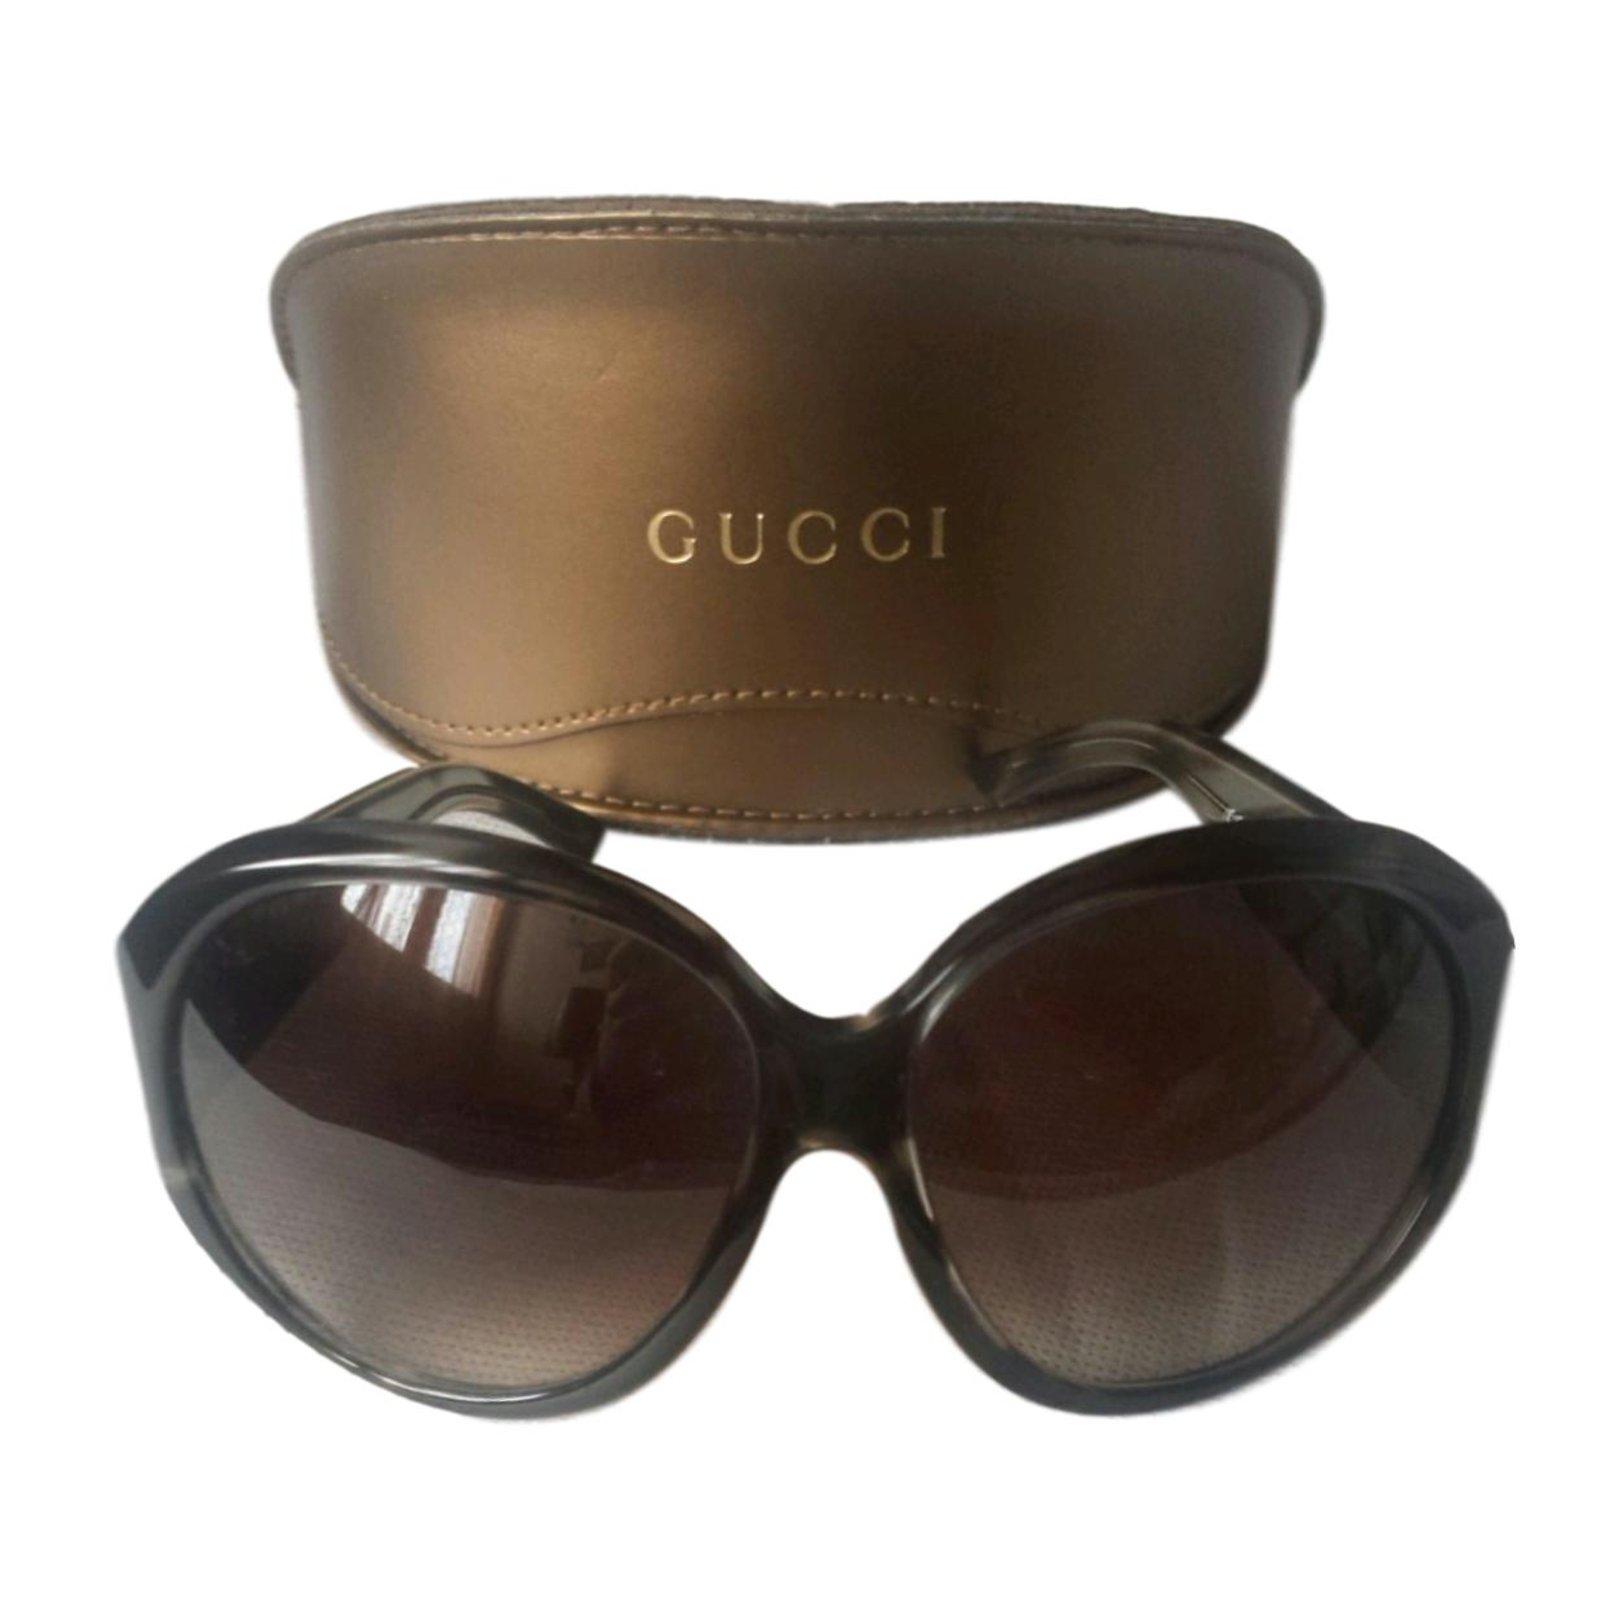 680bd7c913d Gucci Sunglasses Sunglasses Plastic Dark brown ref.63454 - Joli Closet